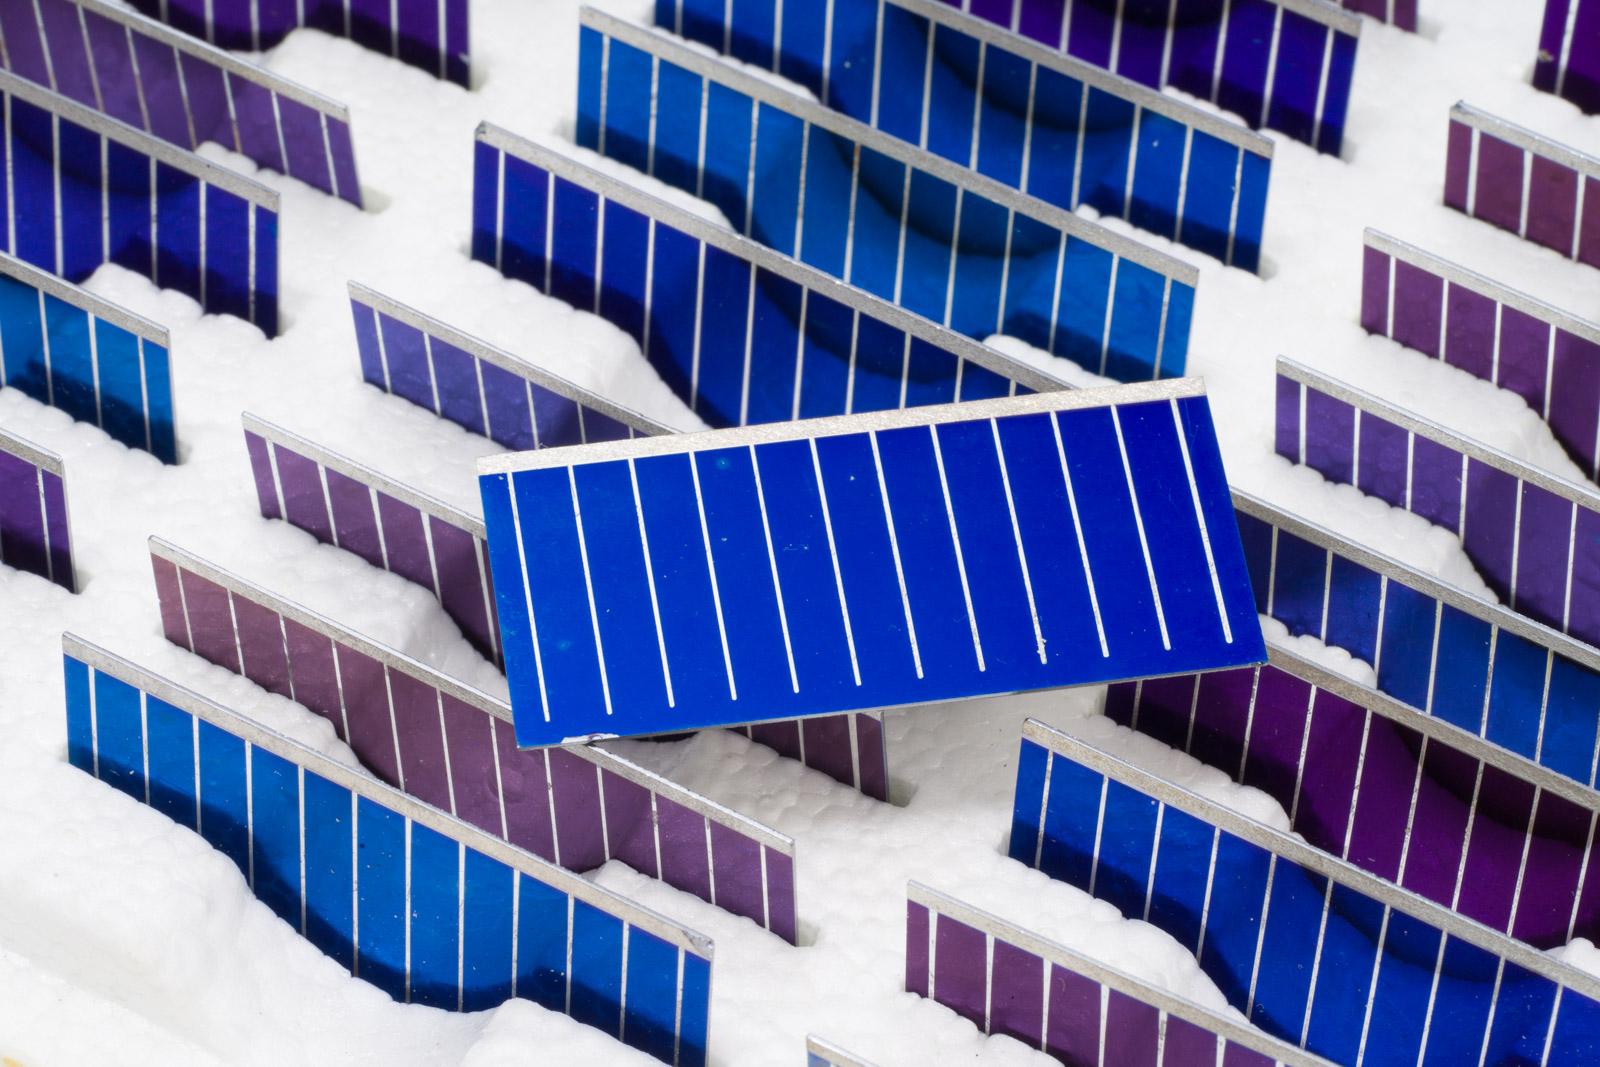 Centralab Solar Cell Skylab